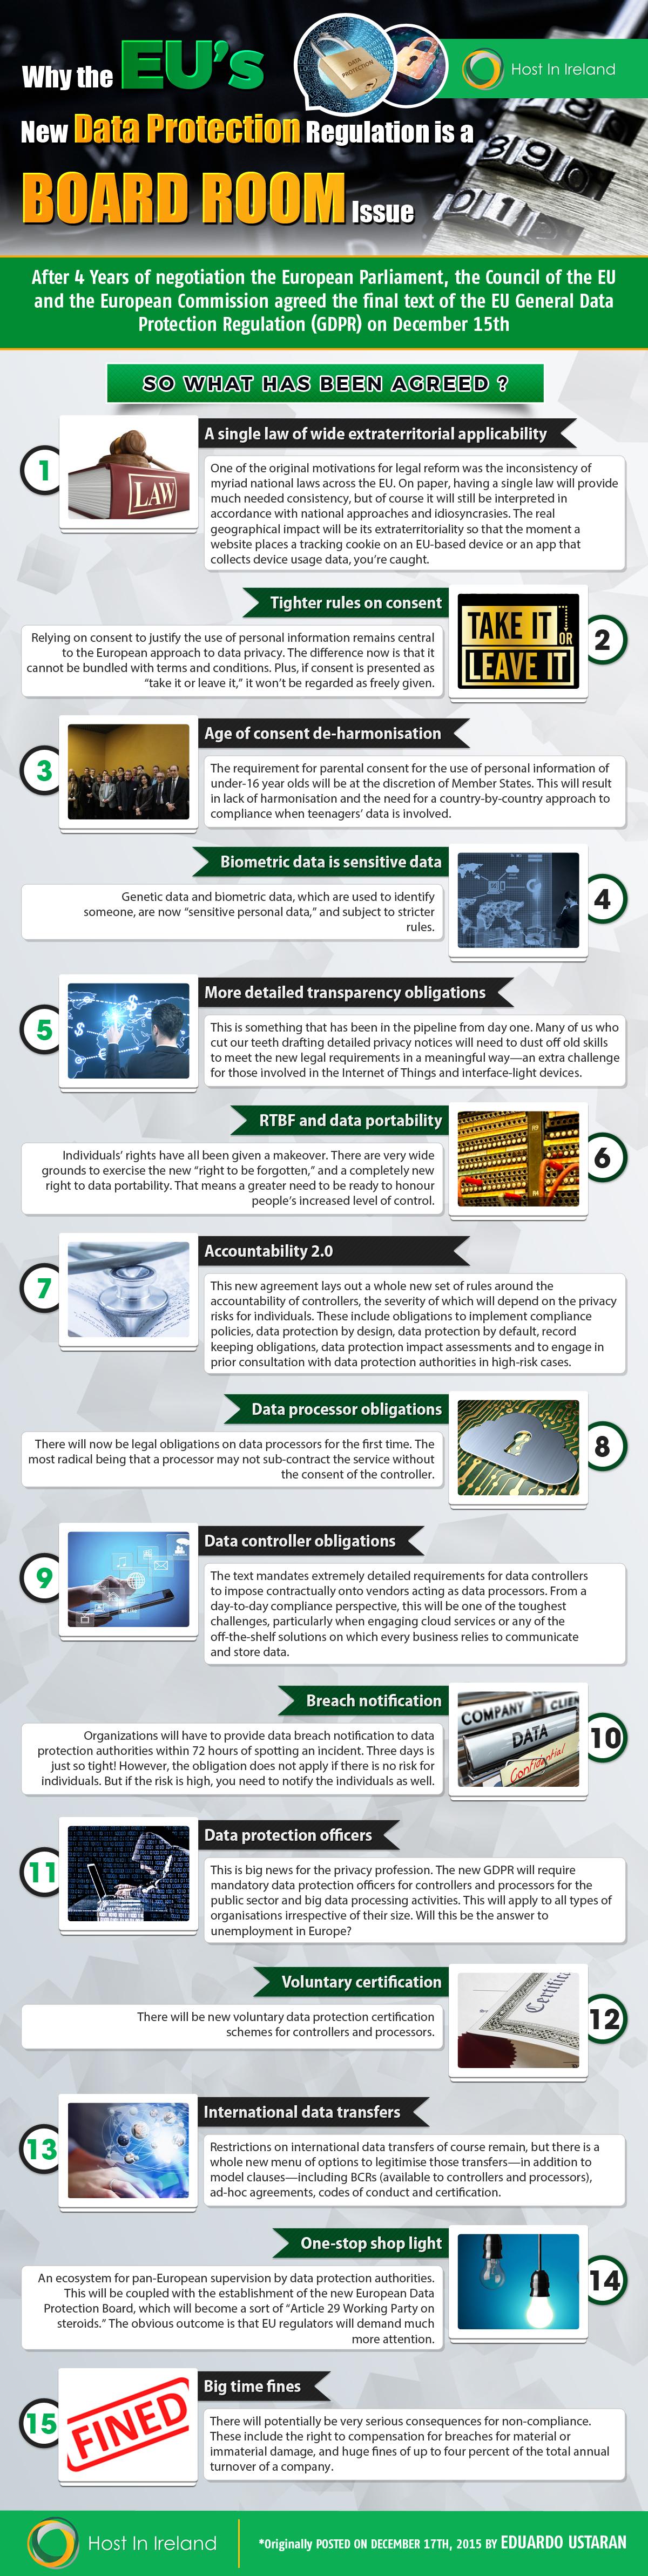 The European Union's New Data Regulation